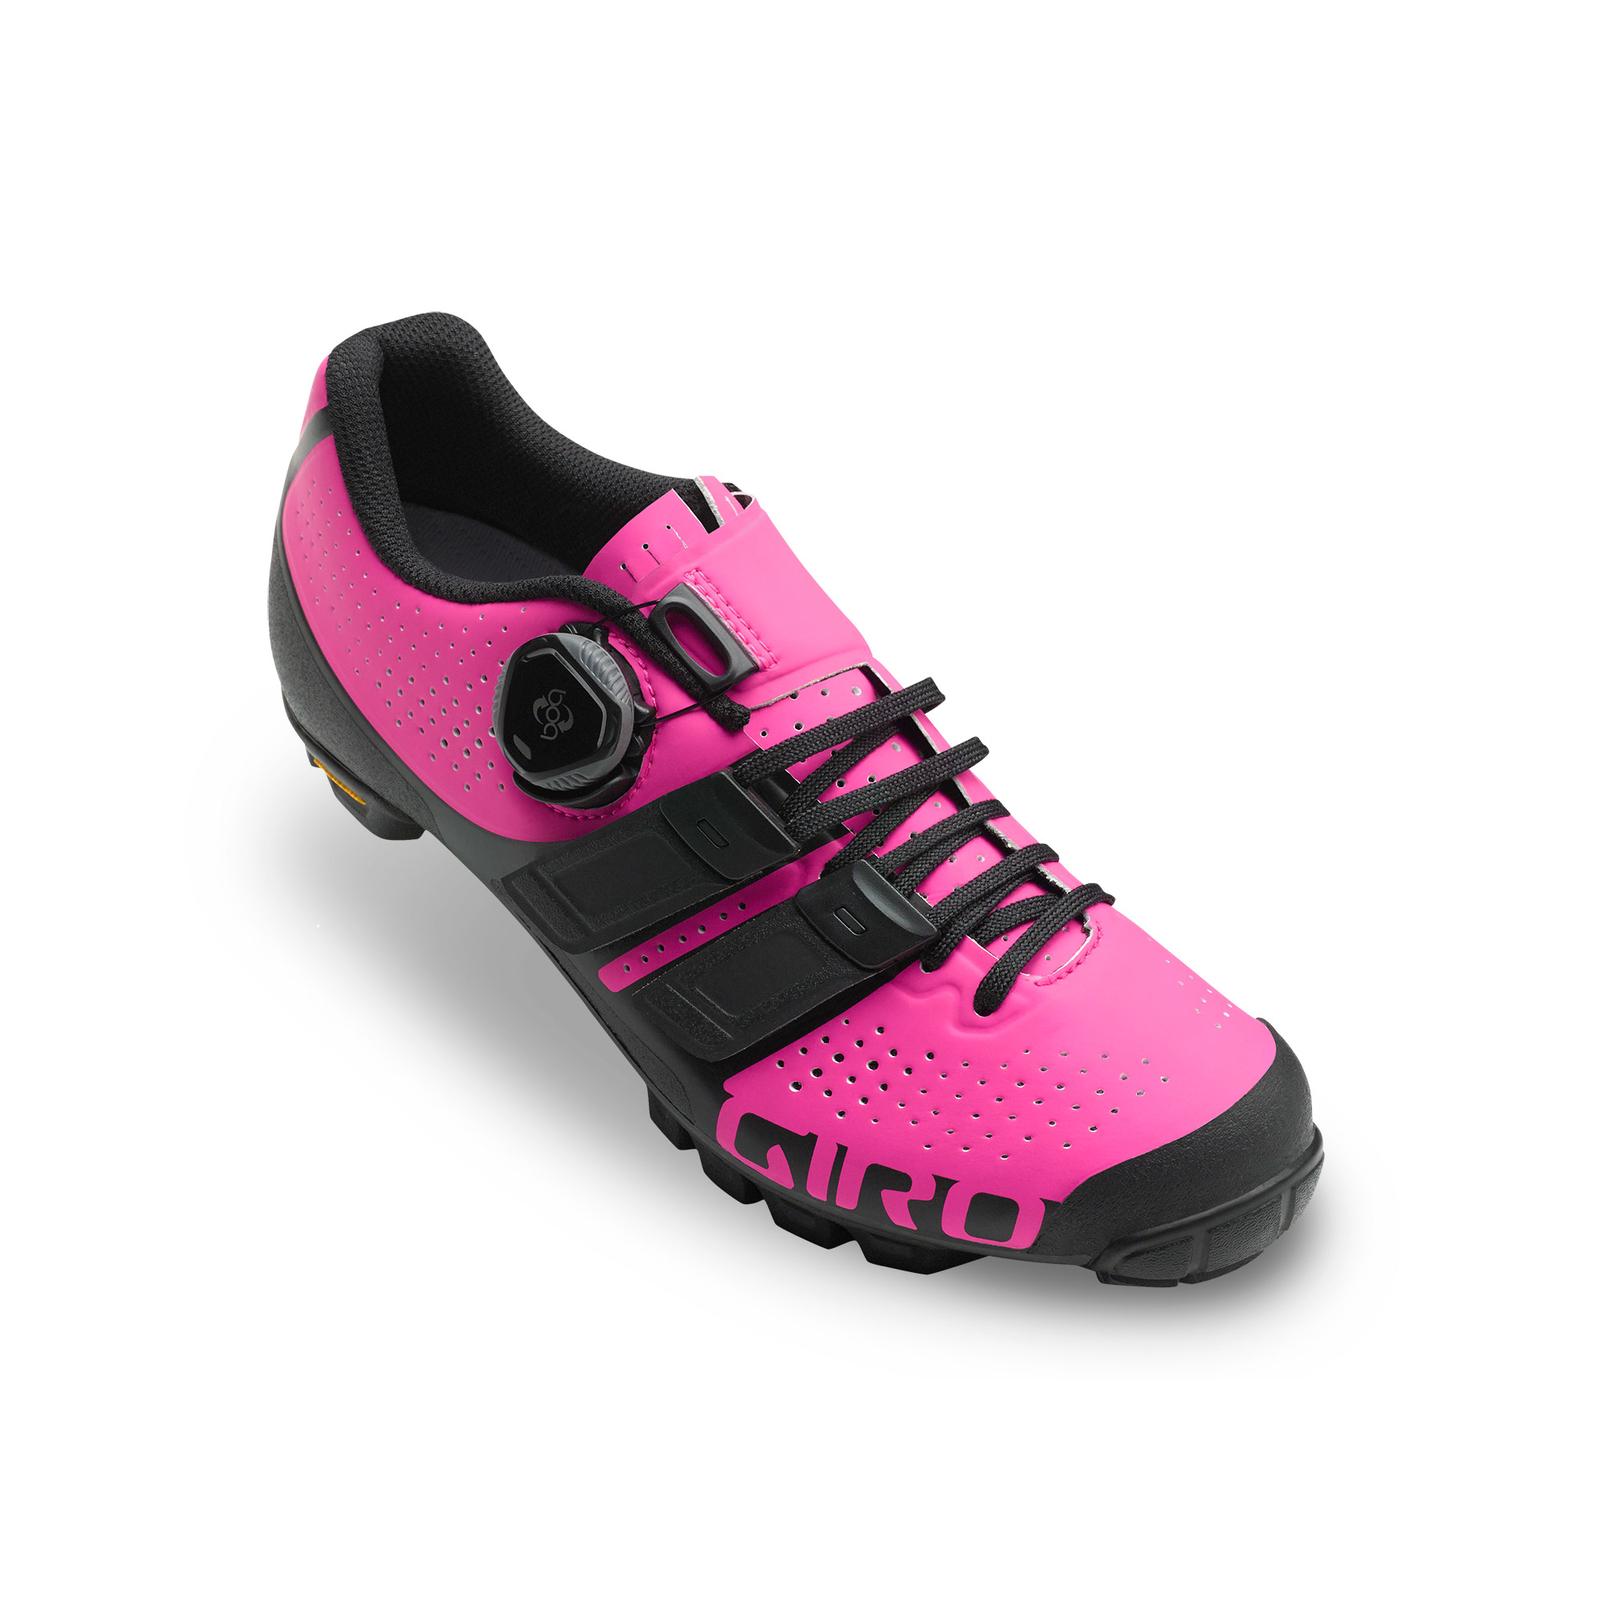 Giro Sica Techlace Damen MTB Schuh 18 blackbright pink